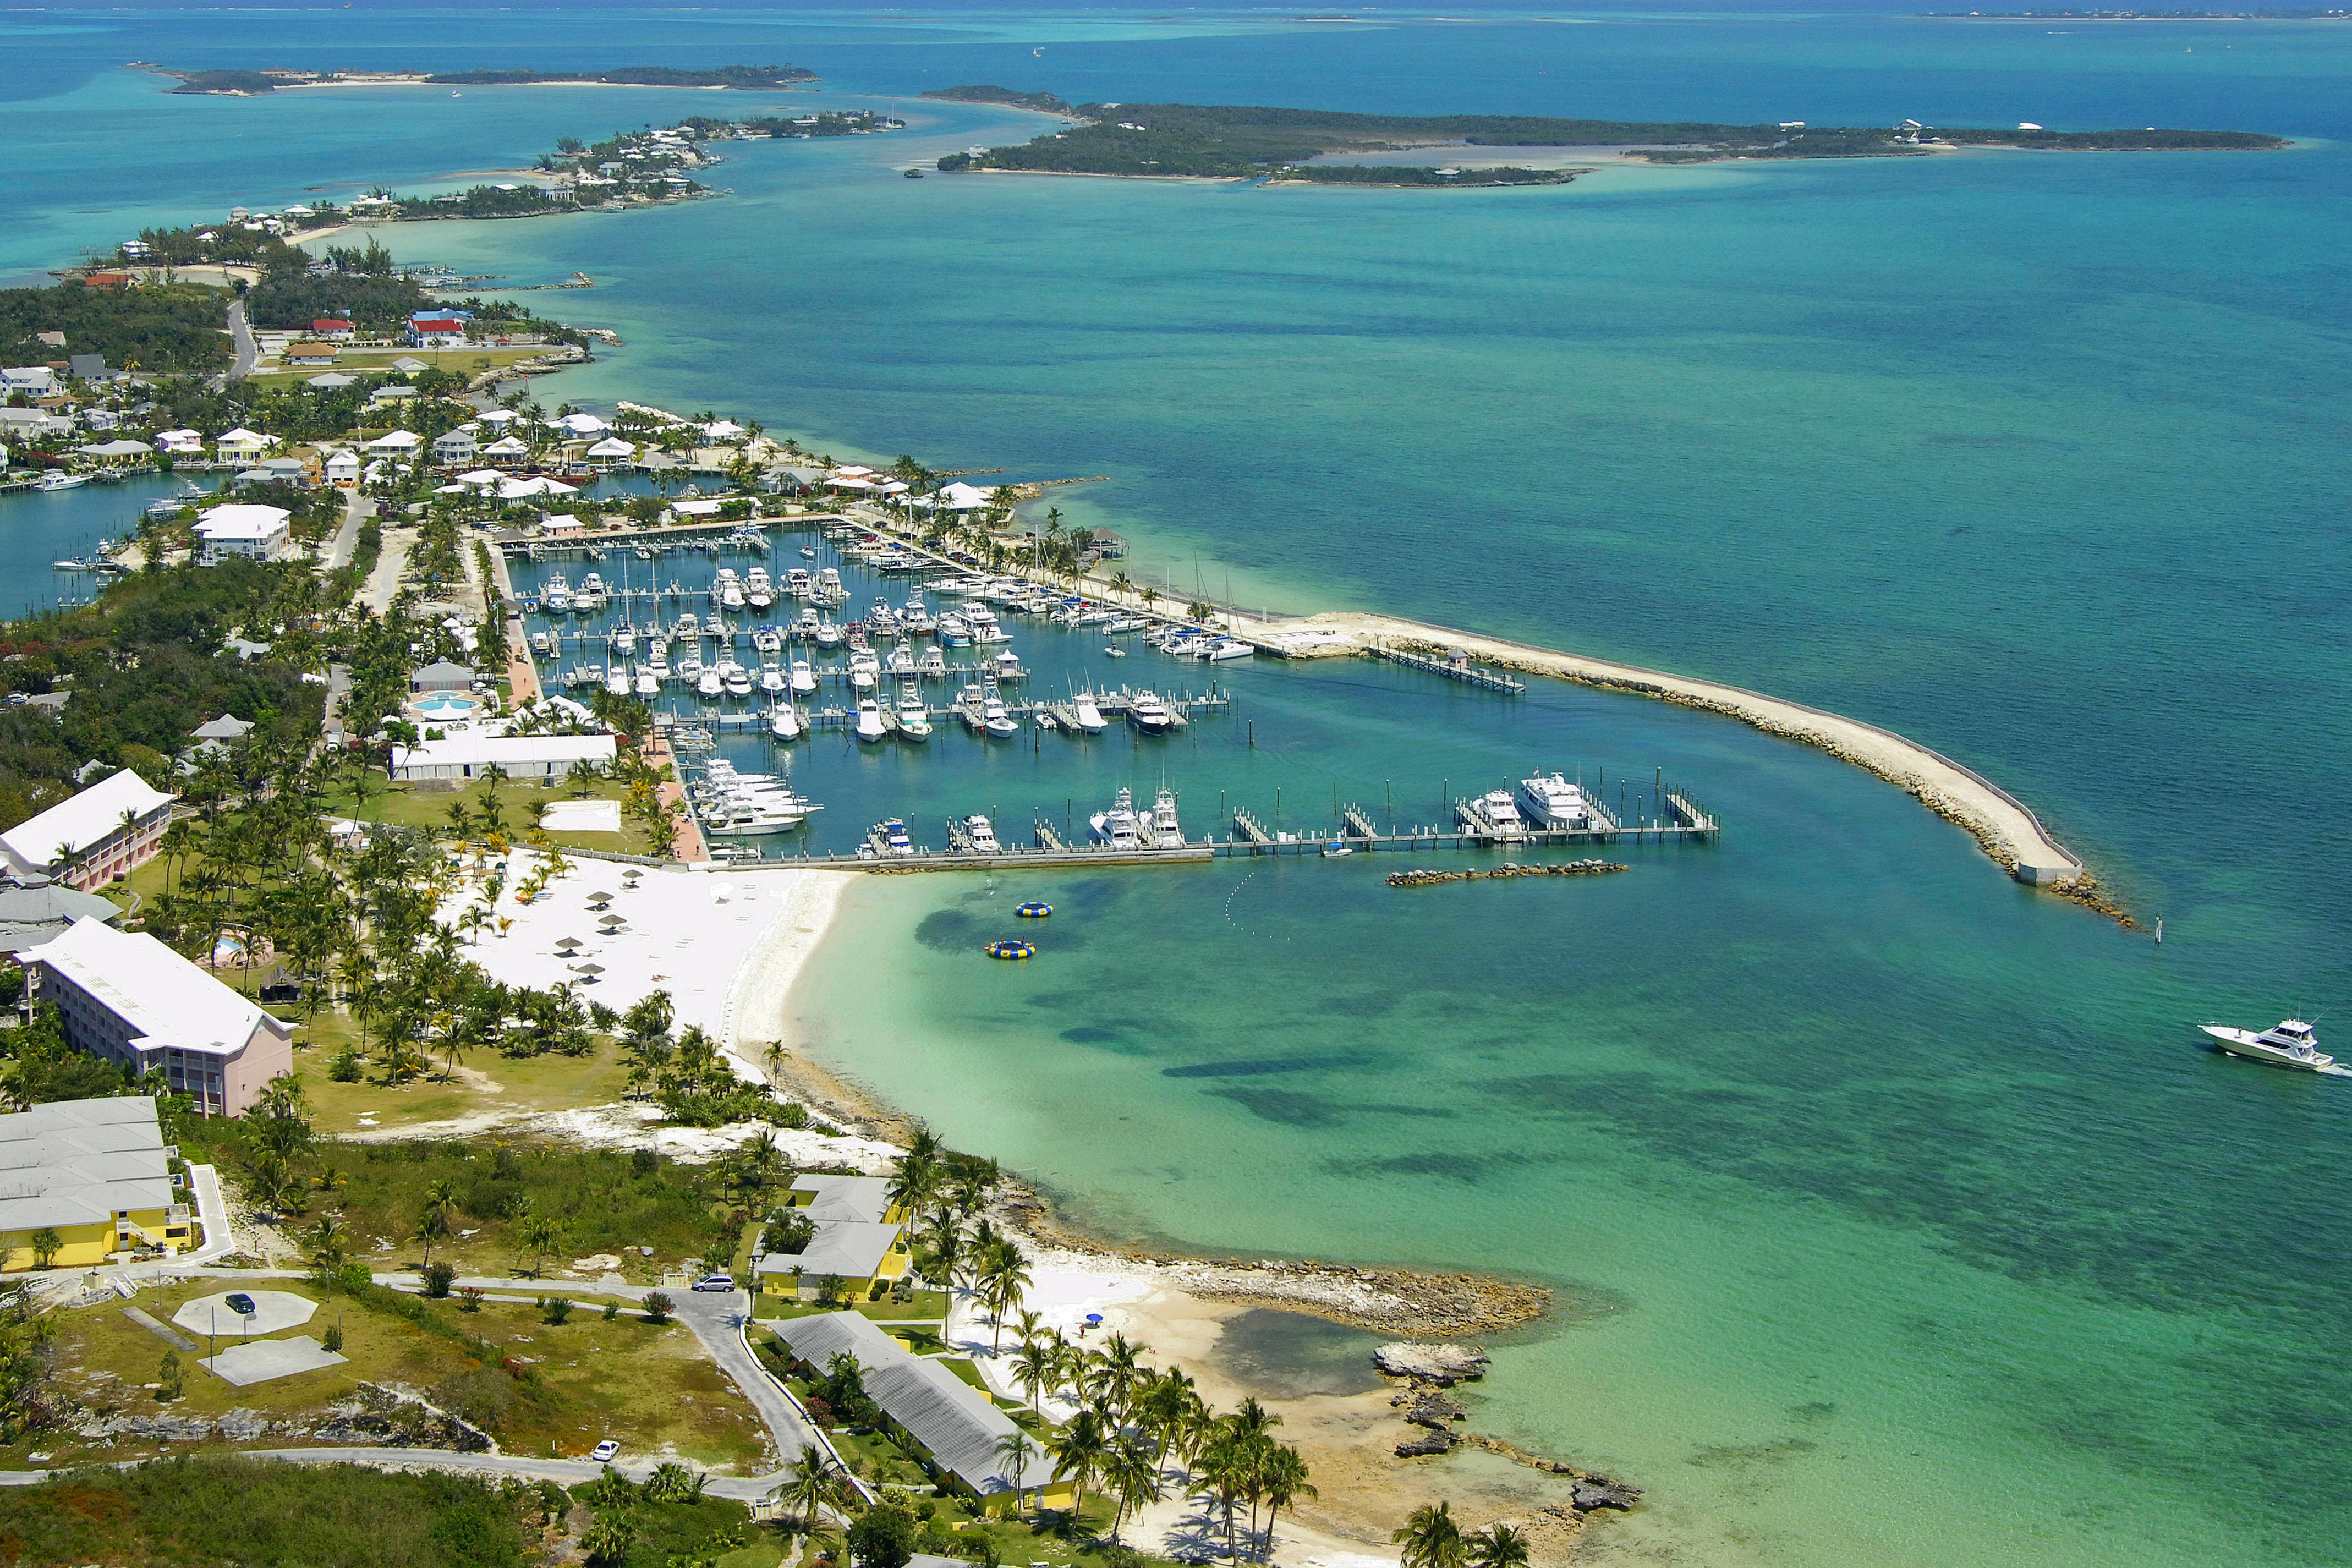 Harbor Island Luxury Resorts